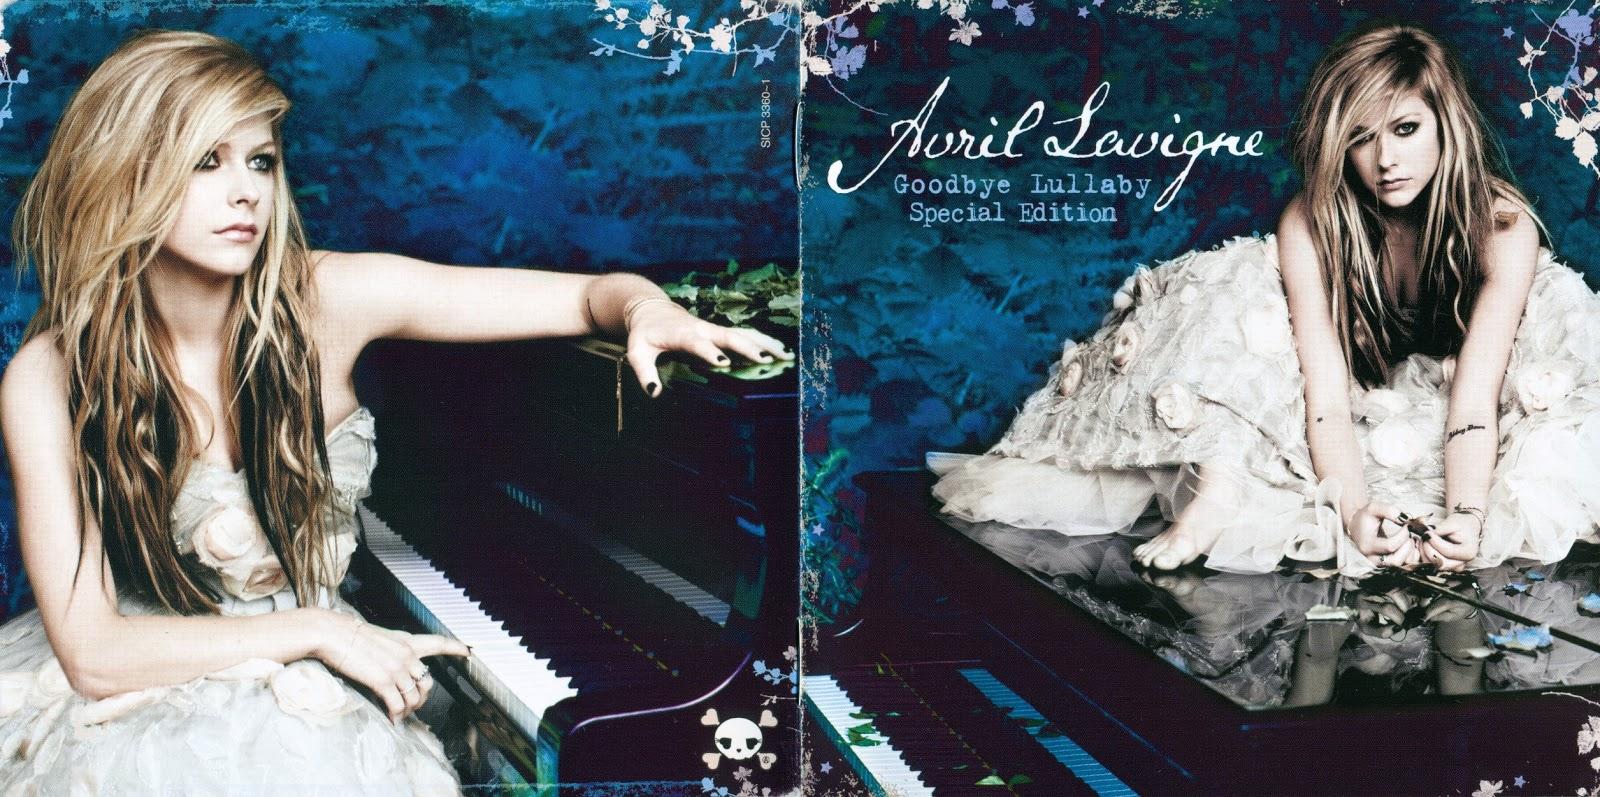 Avril Lavigne - Goodbye Lullaby - http://www.megaupload.com/?d ...